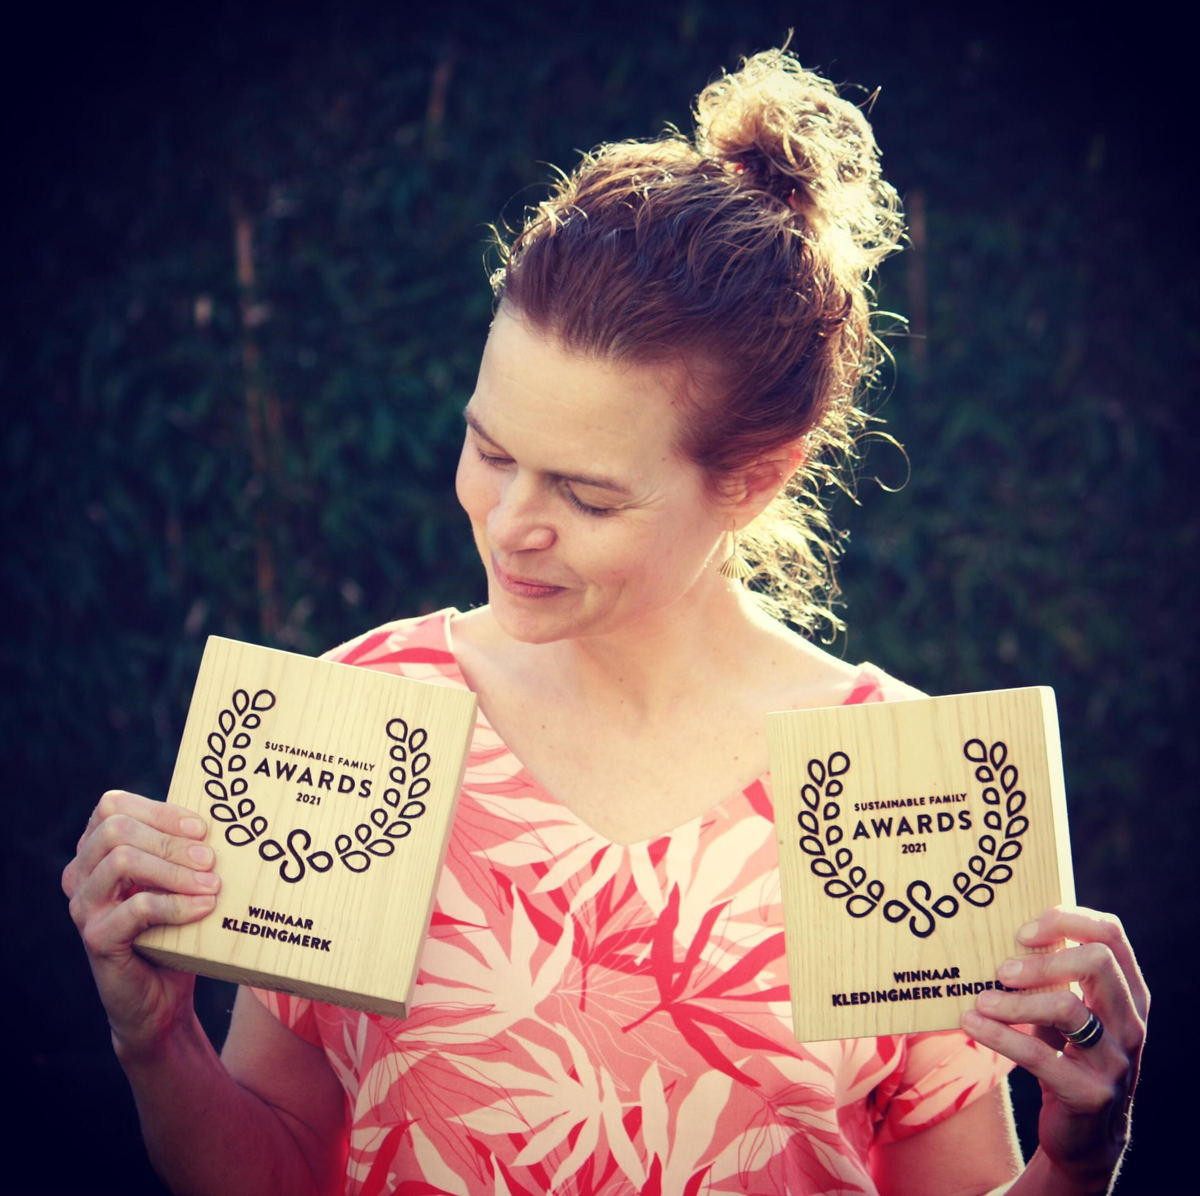 Anne De Smedt met de Sustainable Family Awards voor Lily-Balou